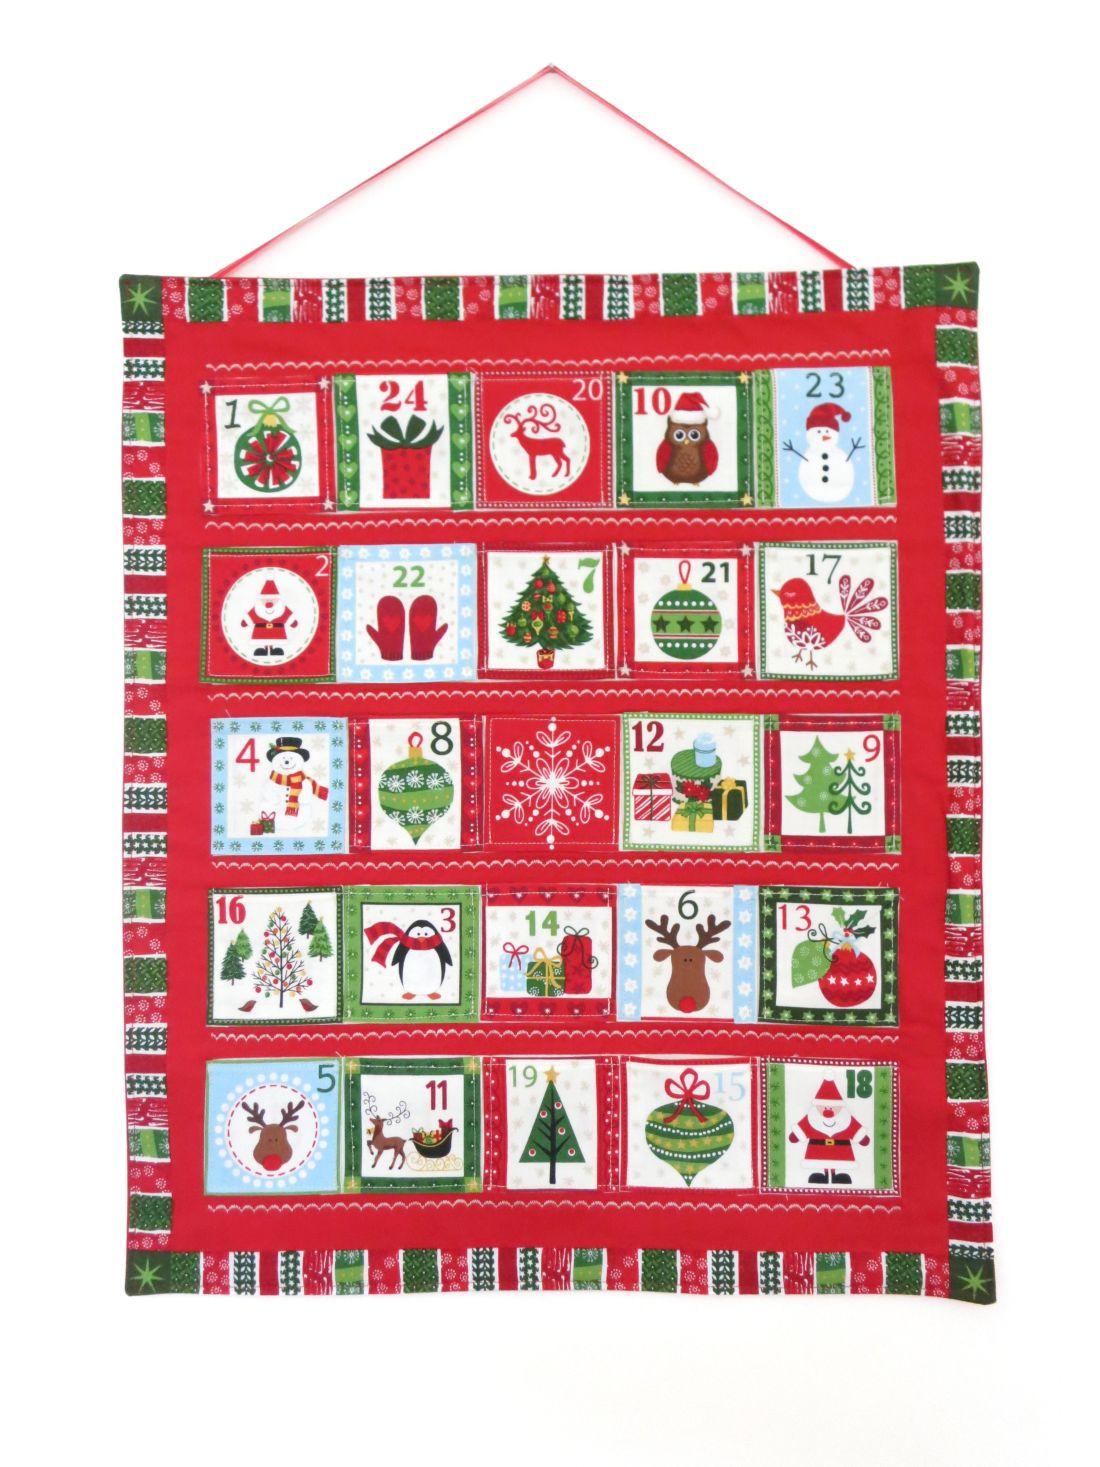 11etsy_fabric-advent-calendar-red-bowbeanie.etsy_.com-al39.99.jpg